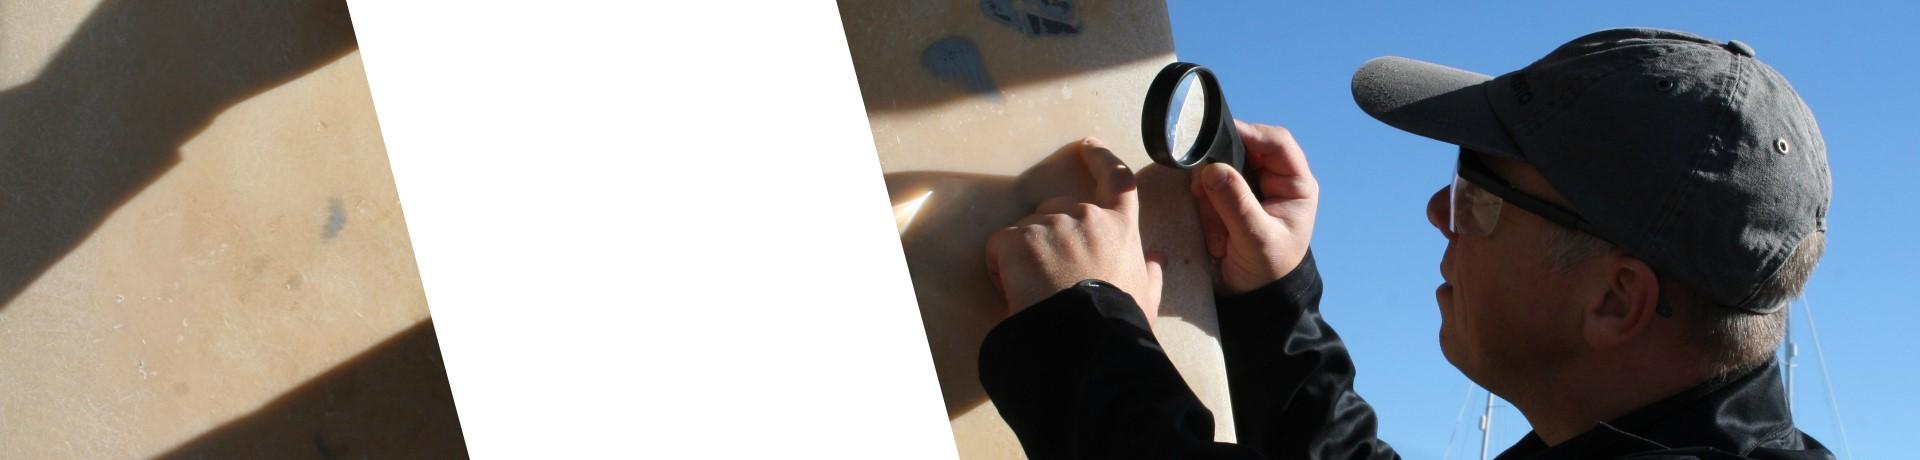 Inspecting a Rudder split